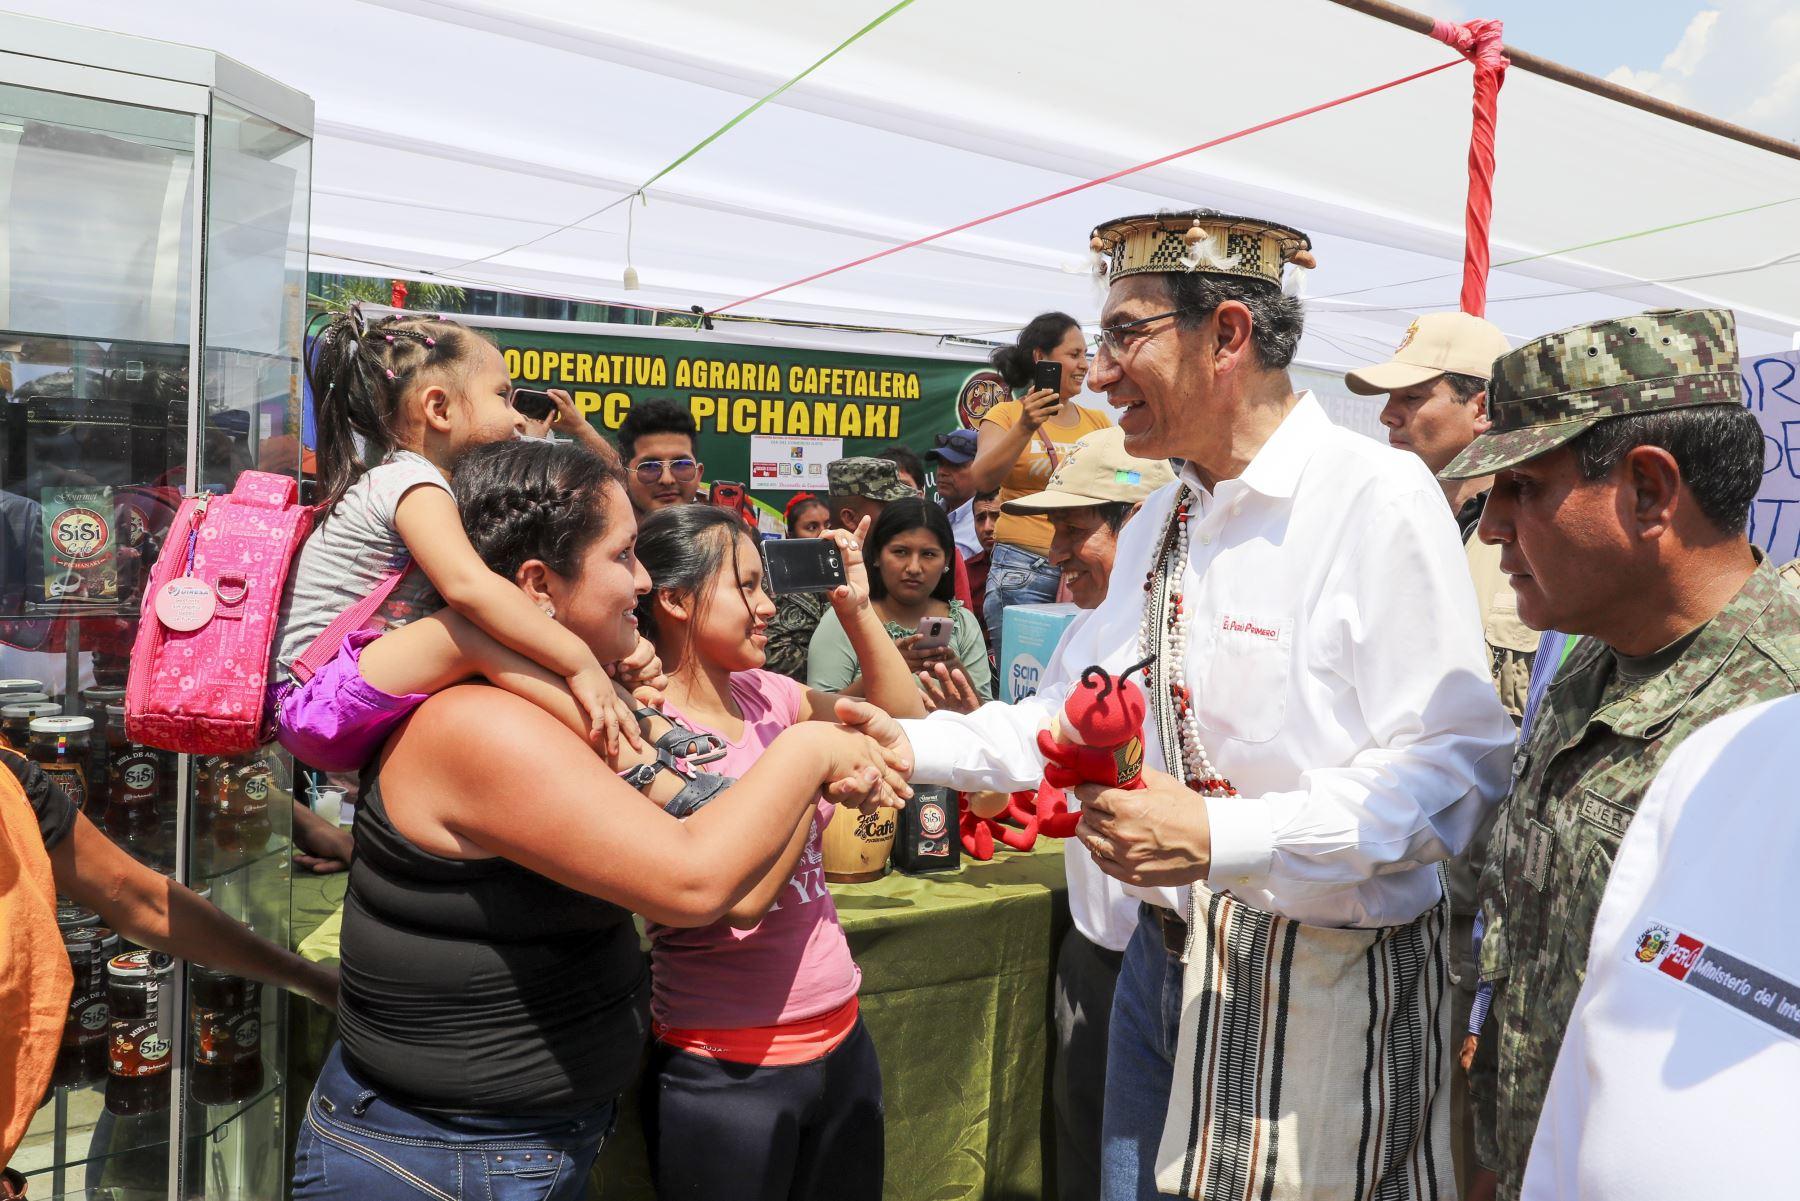 Presidente Vizcarra participa en 20° Festival Nacional del Café Pichanaqui 2019. Foto: ANDINA/Prensa Presidencia